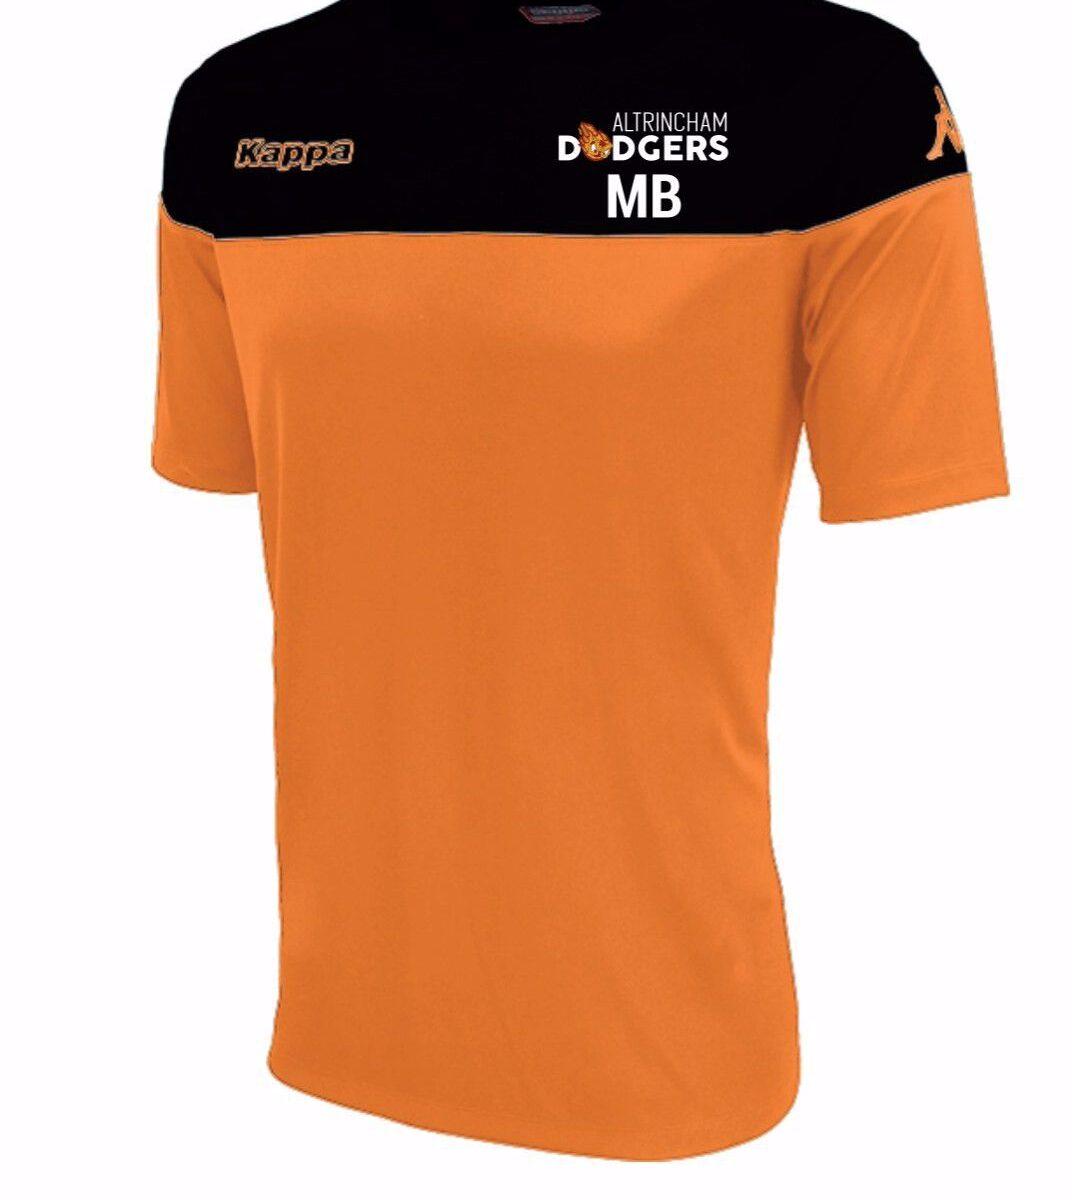 Altrincham Dodgers Training T Shirt Mareto 304INC0  914  - ADULT